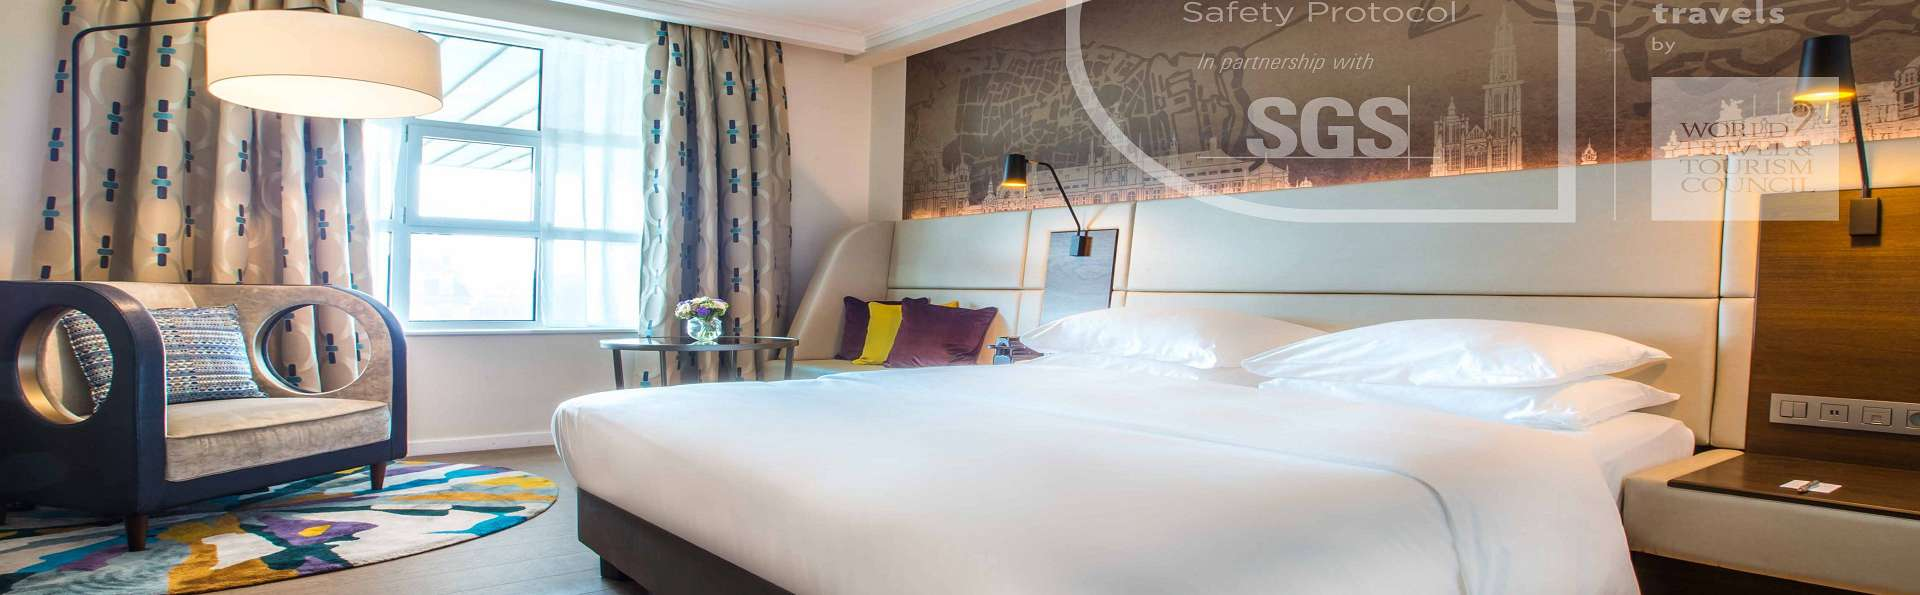 Radisson Blu Astrid Hotel - hoofdfoto_radisson_blu_astrid.jpg